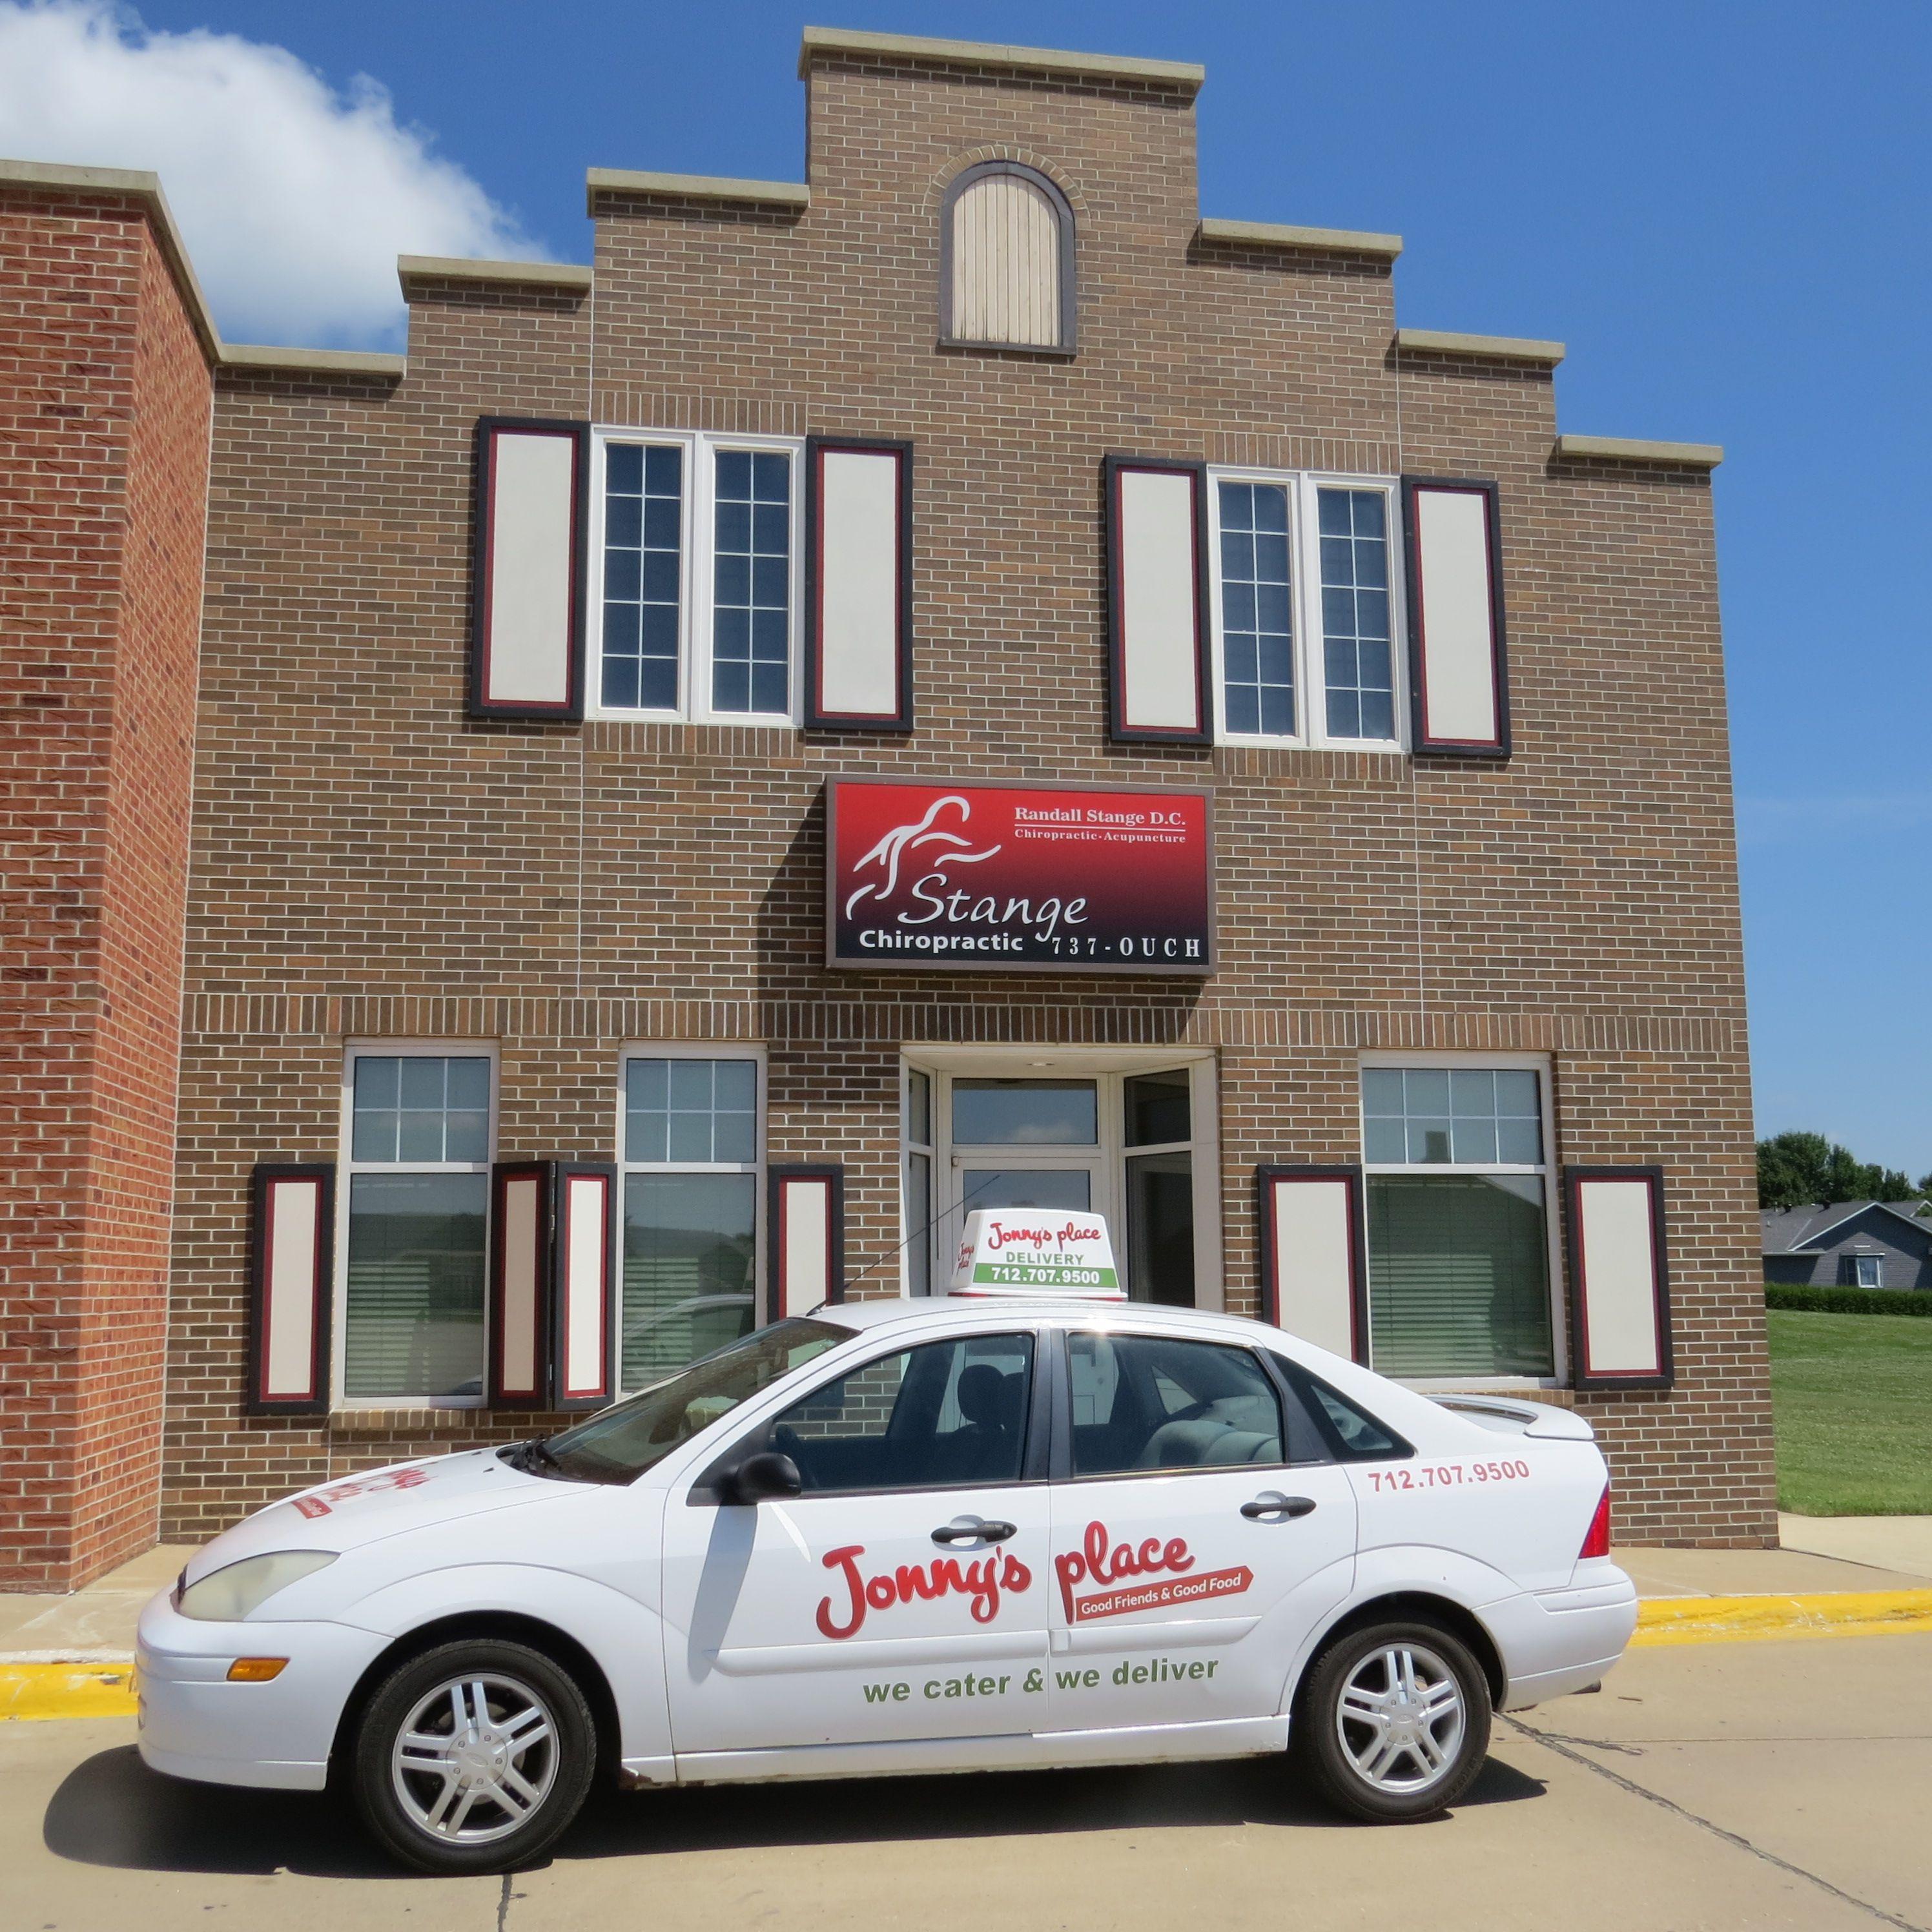 Stange Chiropractic Clinic Orange City Iowa With Images Orange